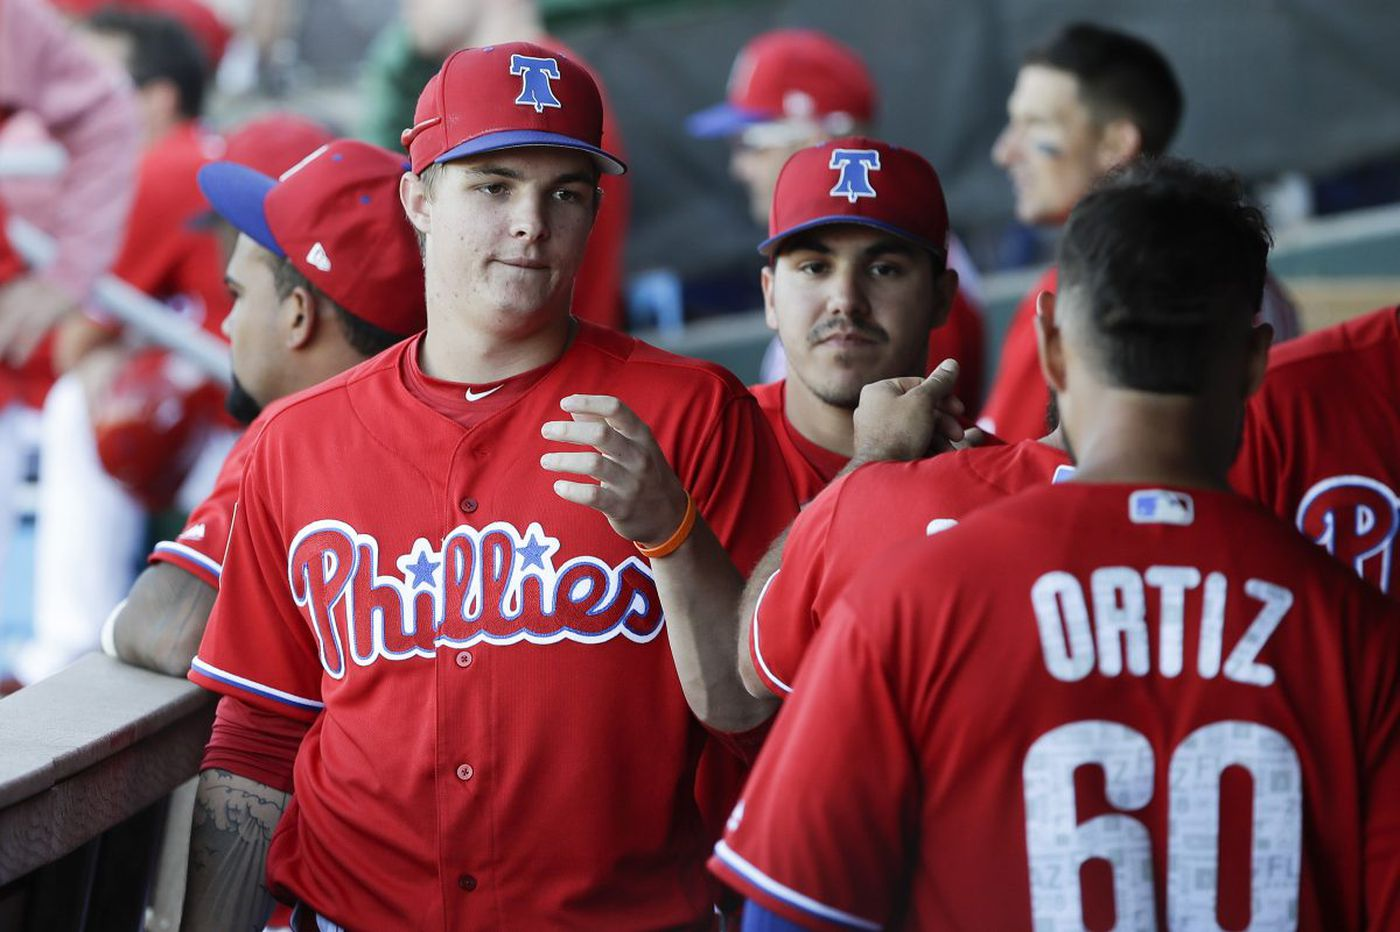 Phillies prospect Mickey Moniak remains confident despite struggles